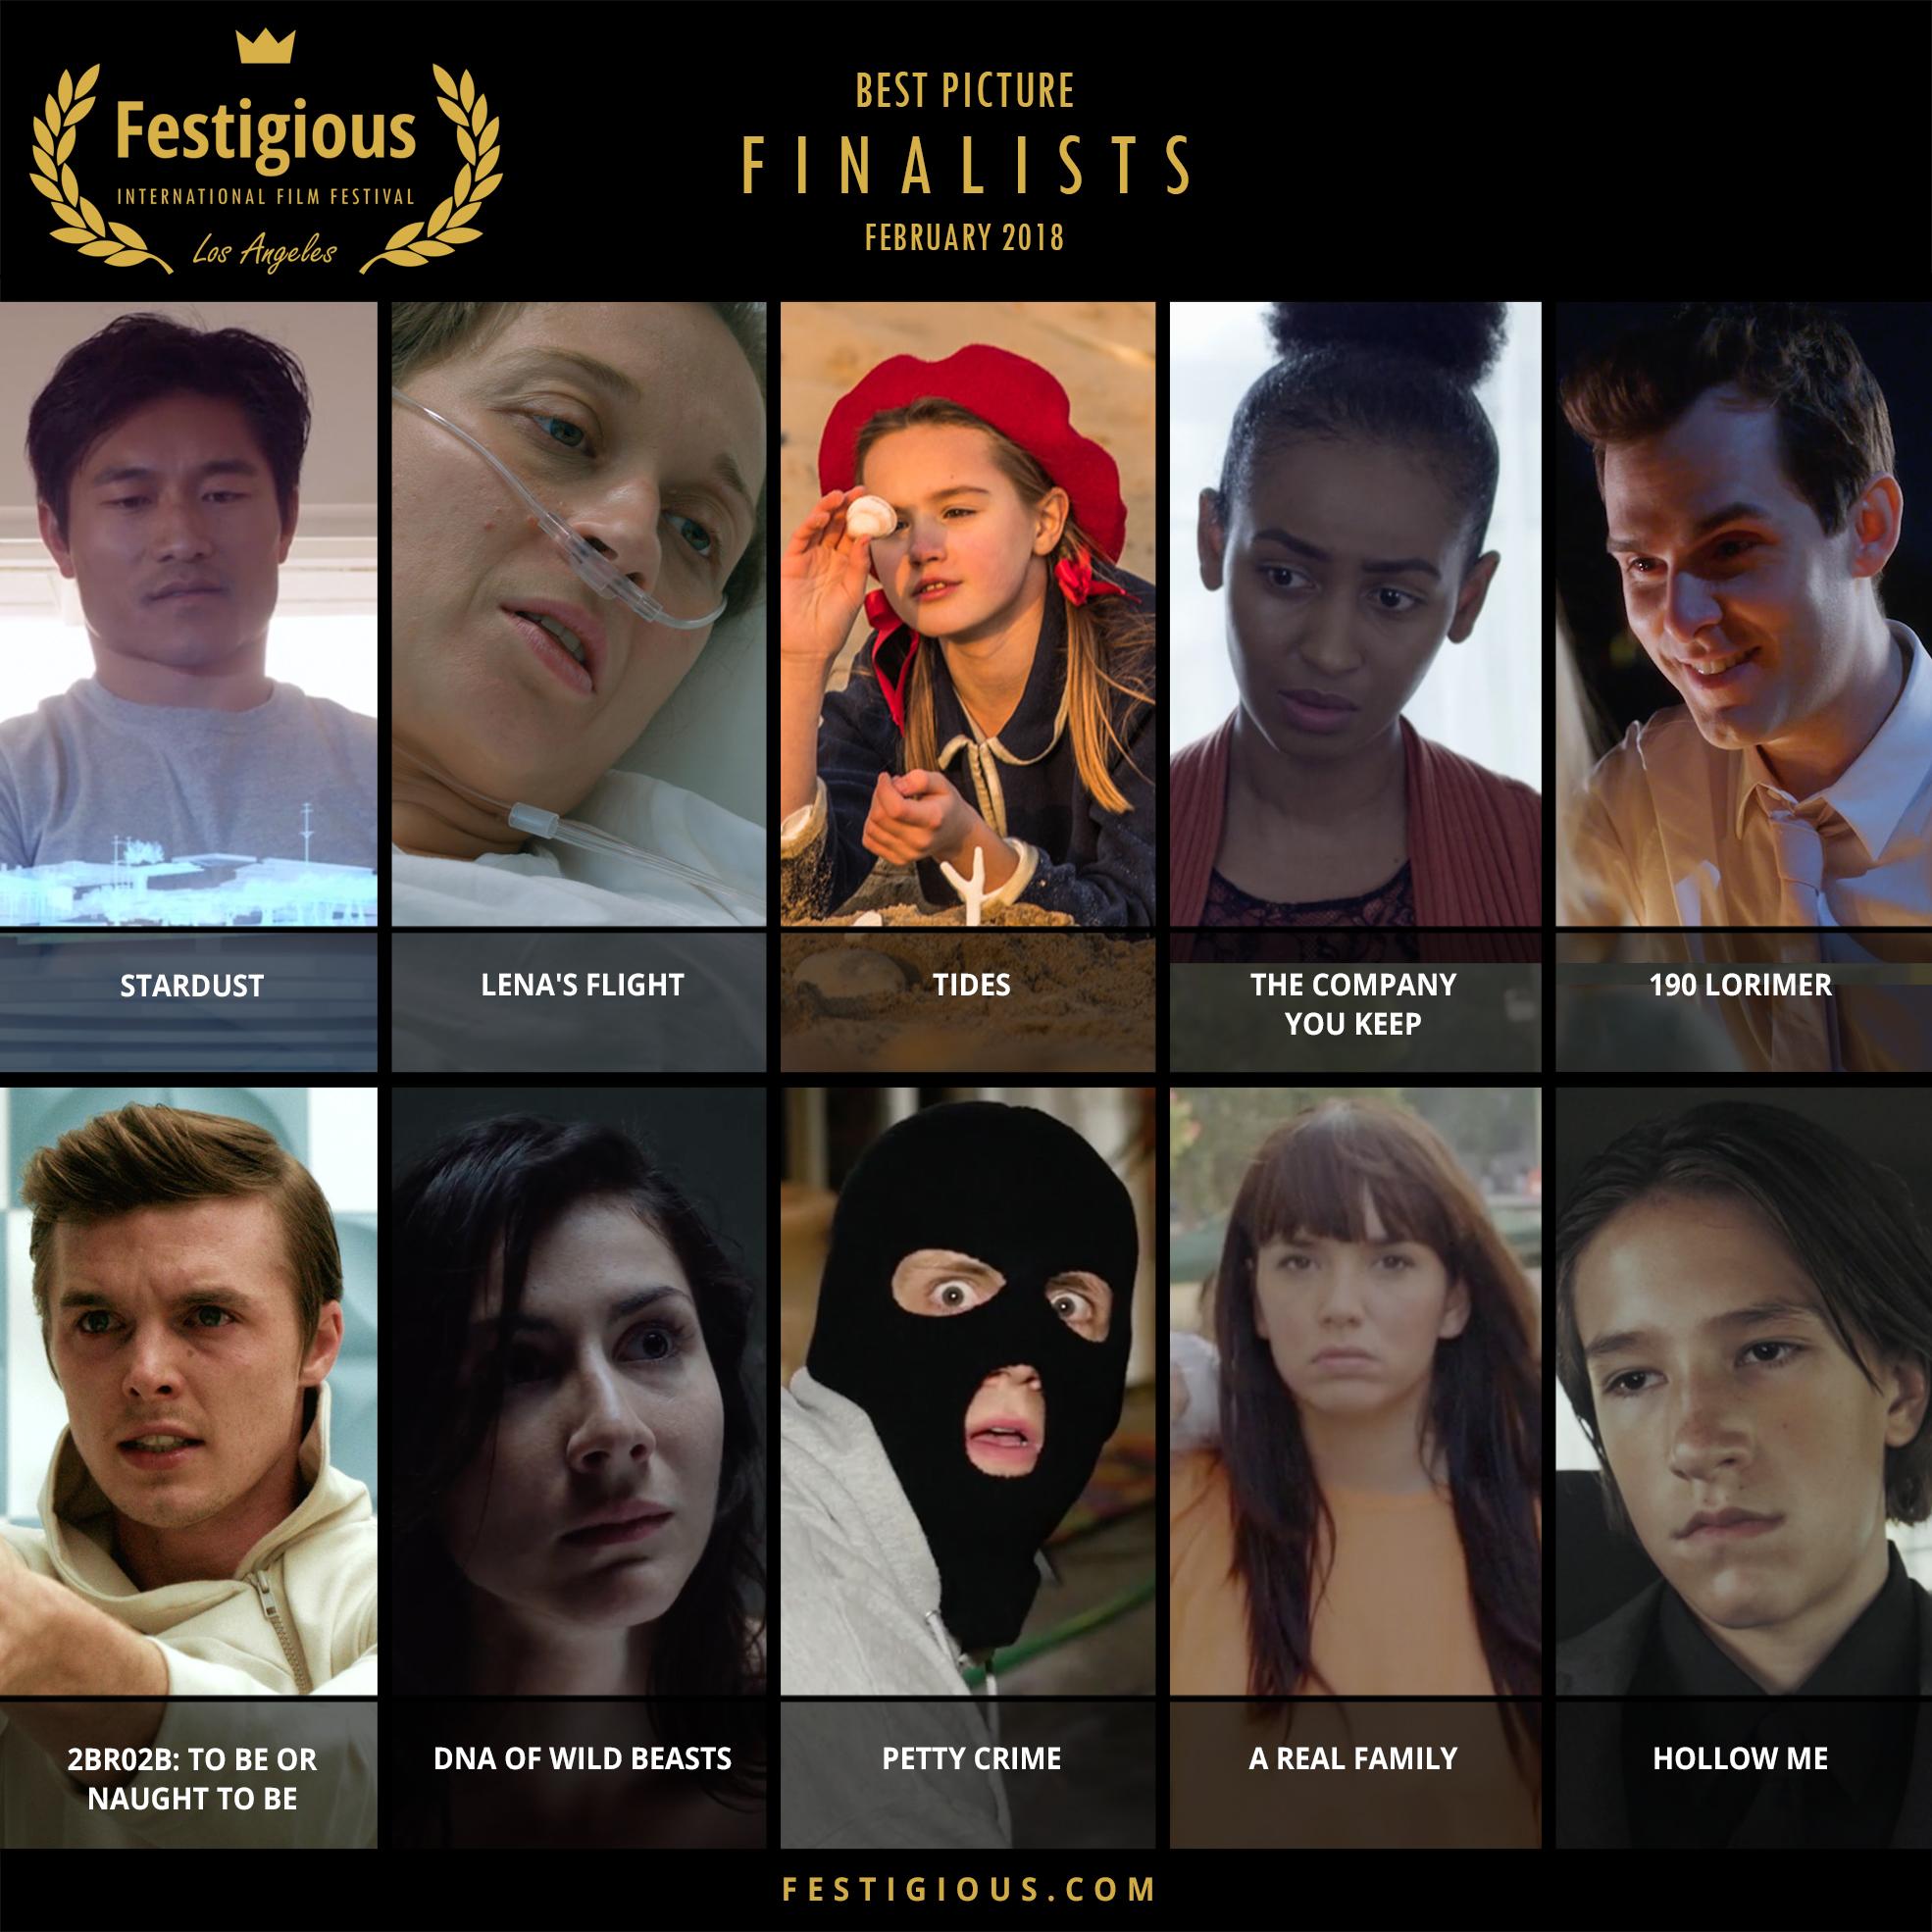 FESTIGIOUS FINALISTS 2018 02